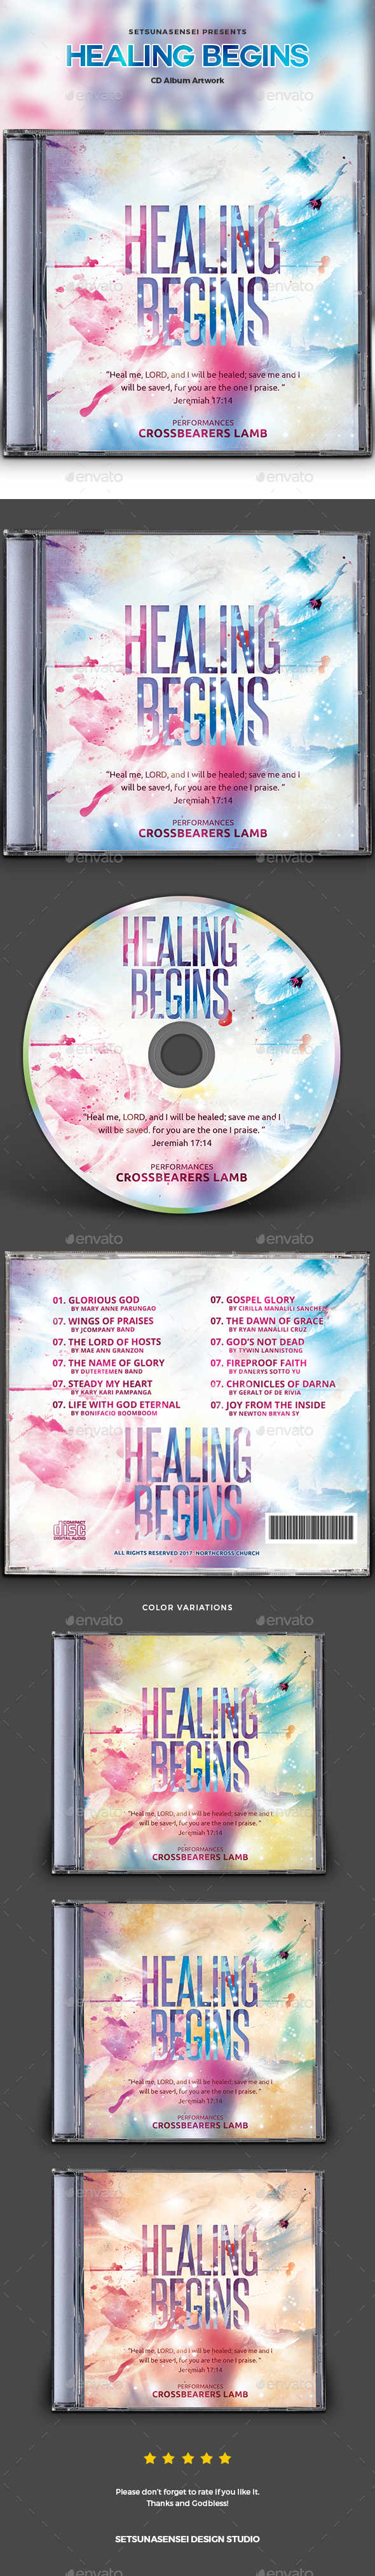 GraphicRiver Healing Begins CD Album Artwork 20882456